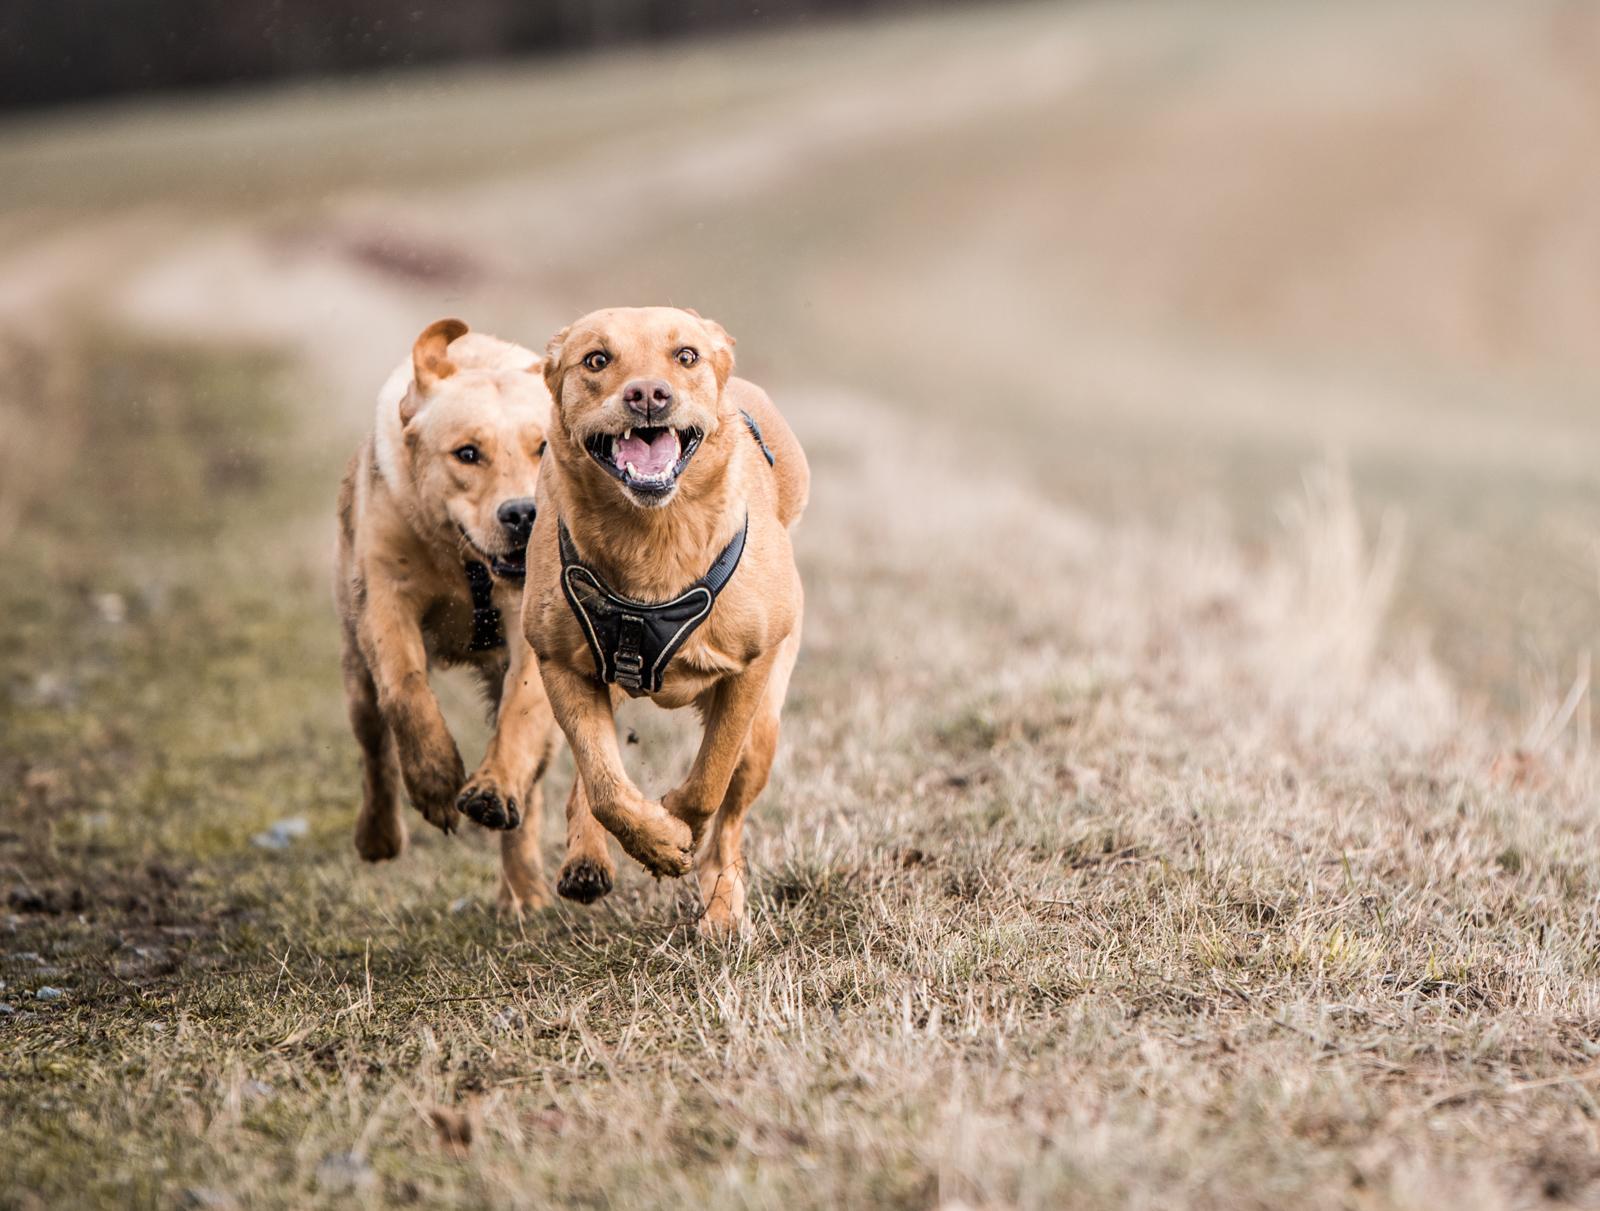 Tierfotograf-Labrador-Sven's Bildwerke-Hund-Hundefotografie11